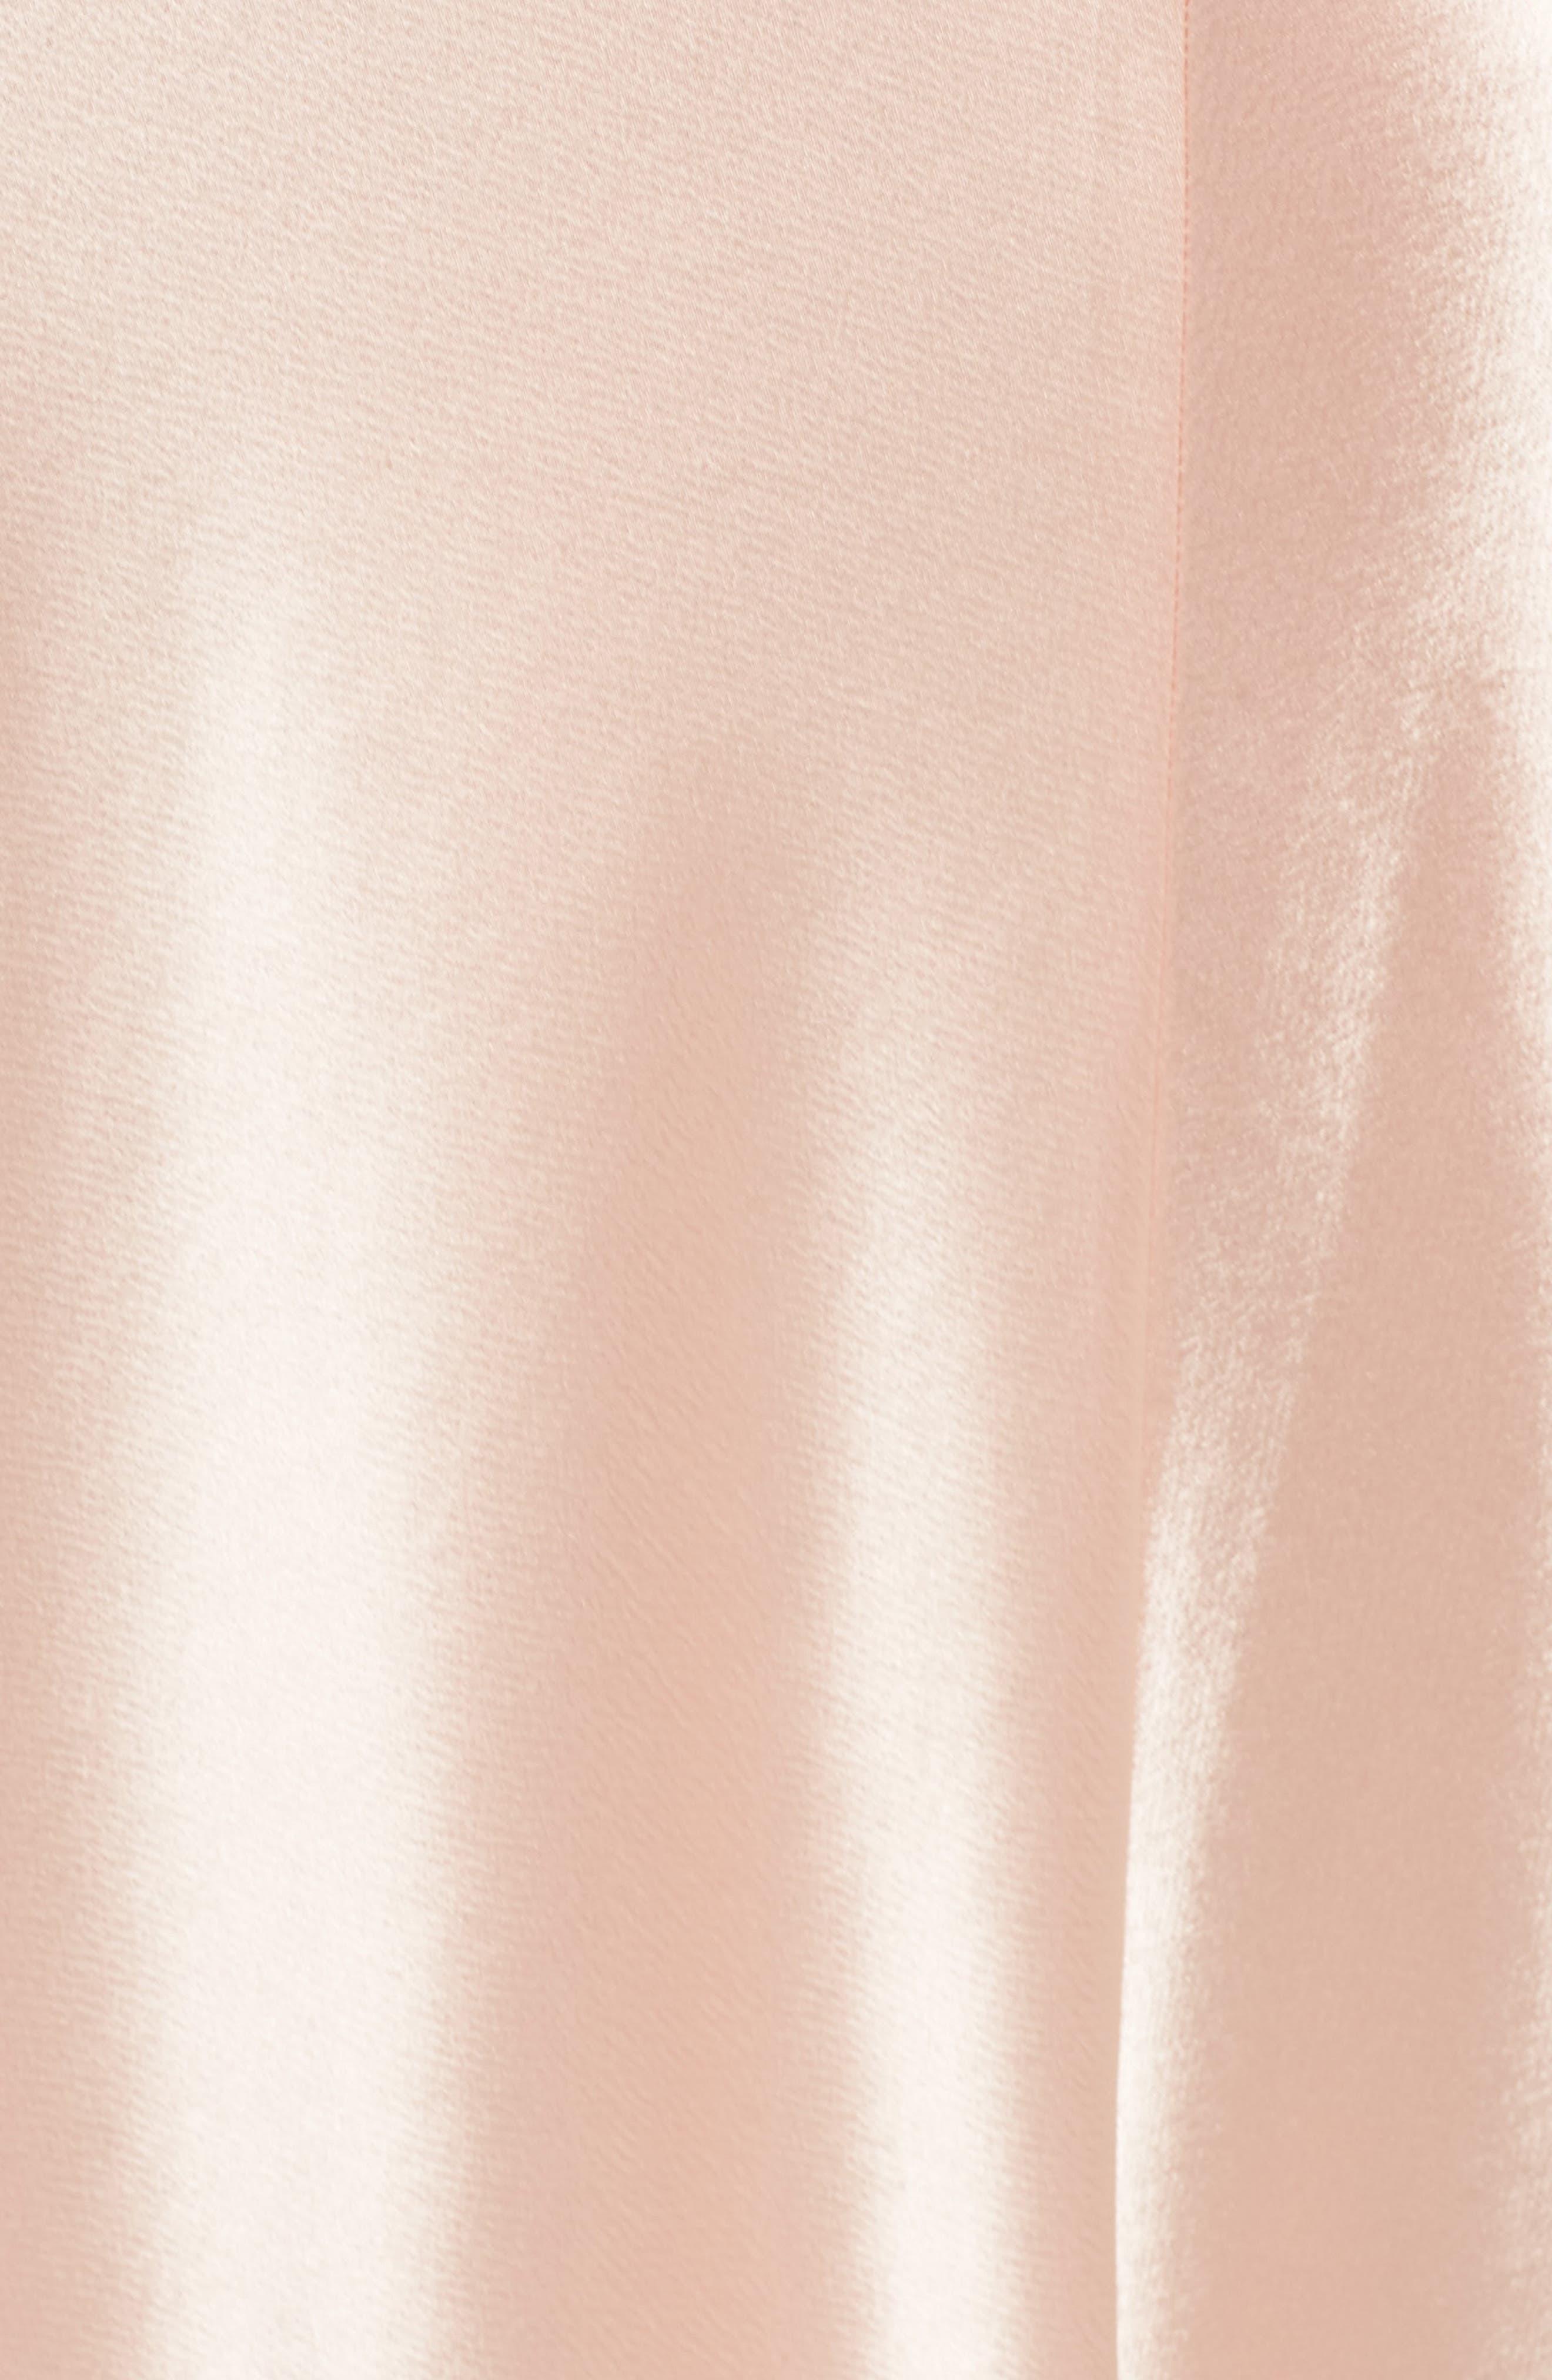 Carmen Embellished Satin Slip Gown,                             Alternate thumbnail 5, color,                             691